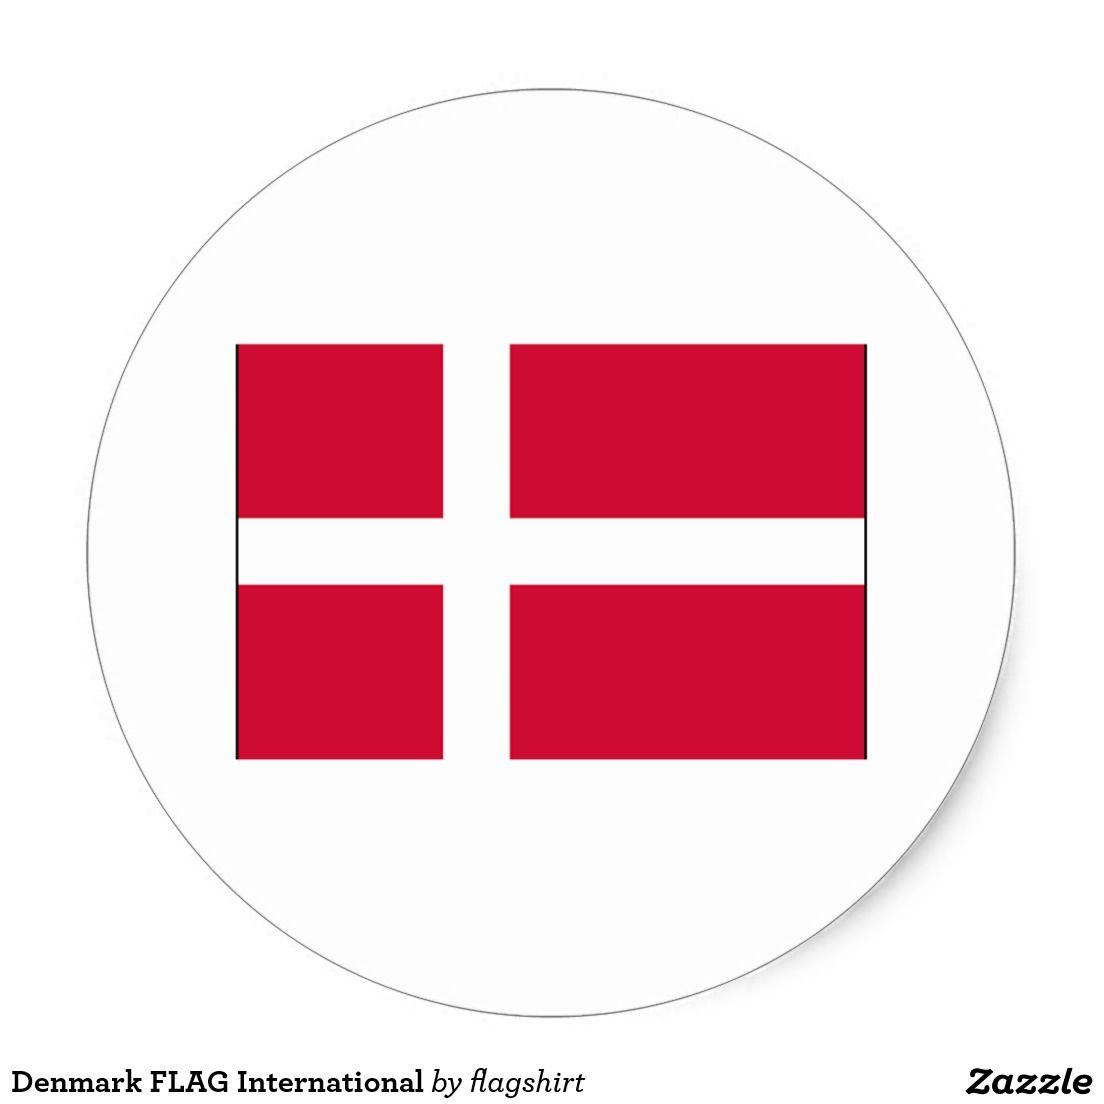 Denmark Flag International Classic Round Sticker Zazzle Com Denmark Flag Round Stickers Create Custom Stickers